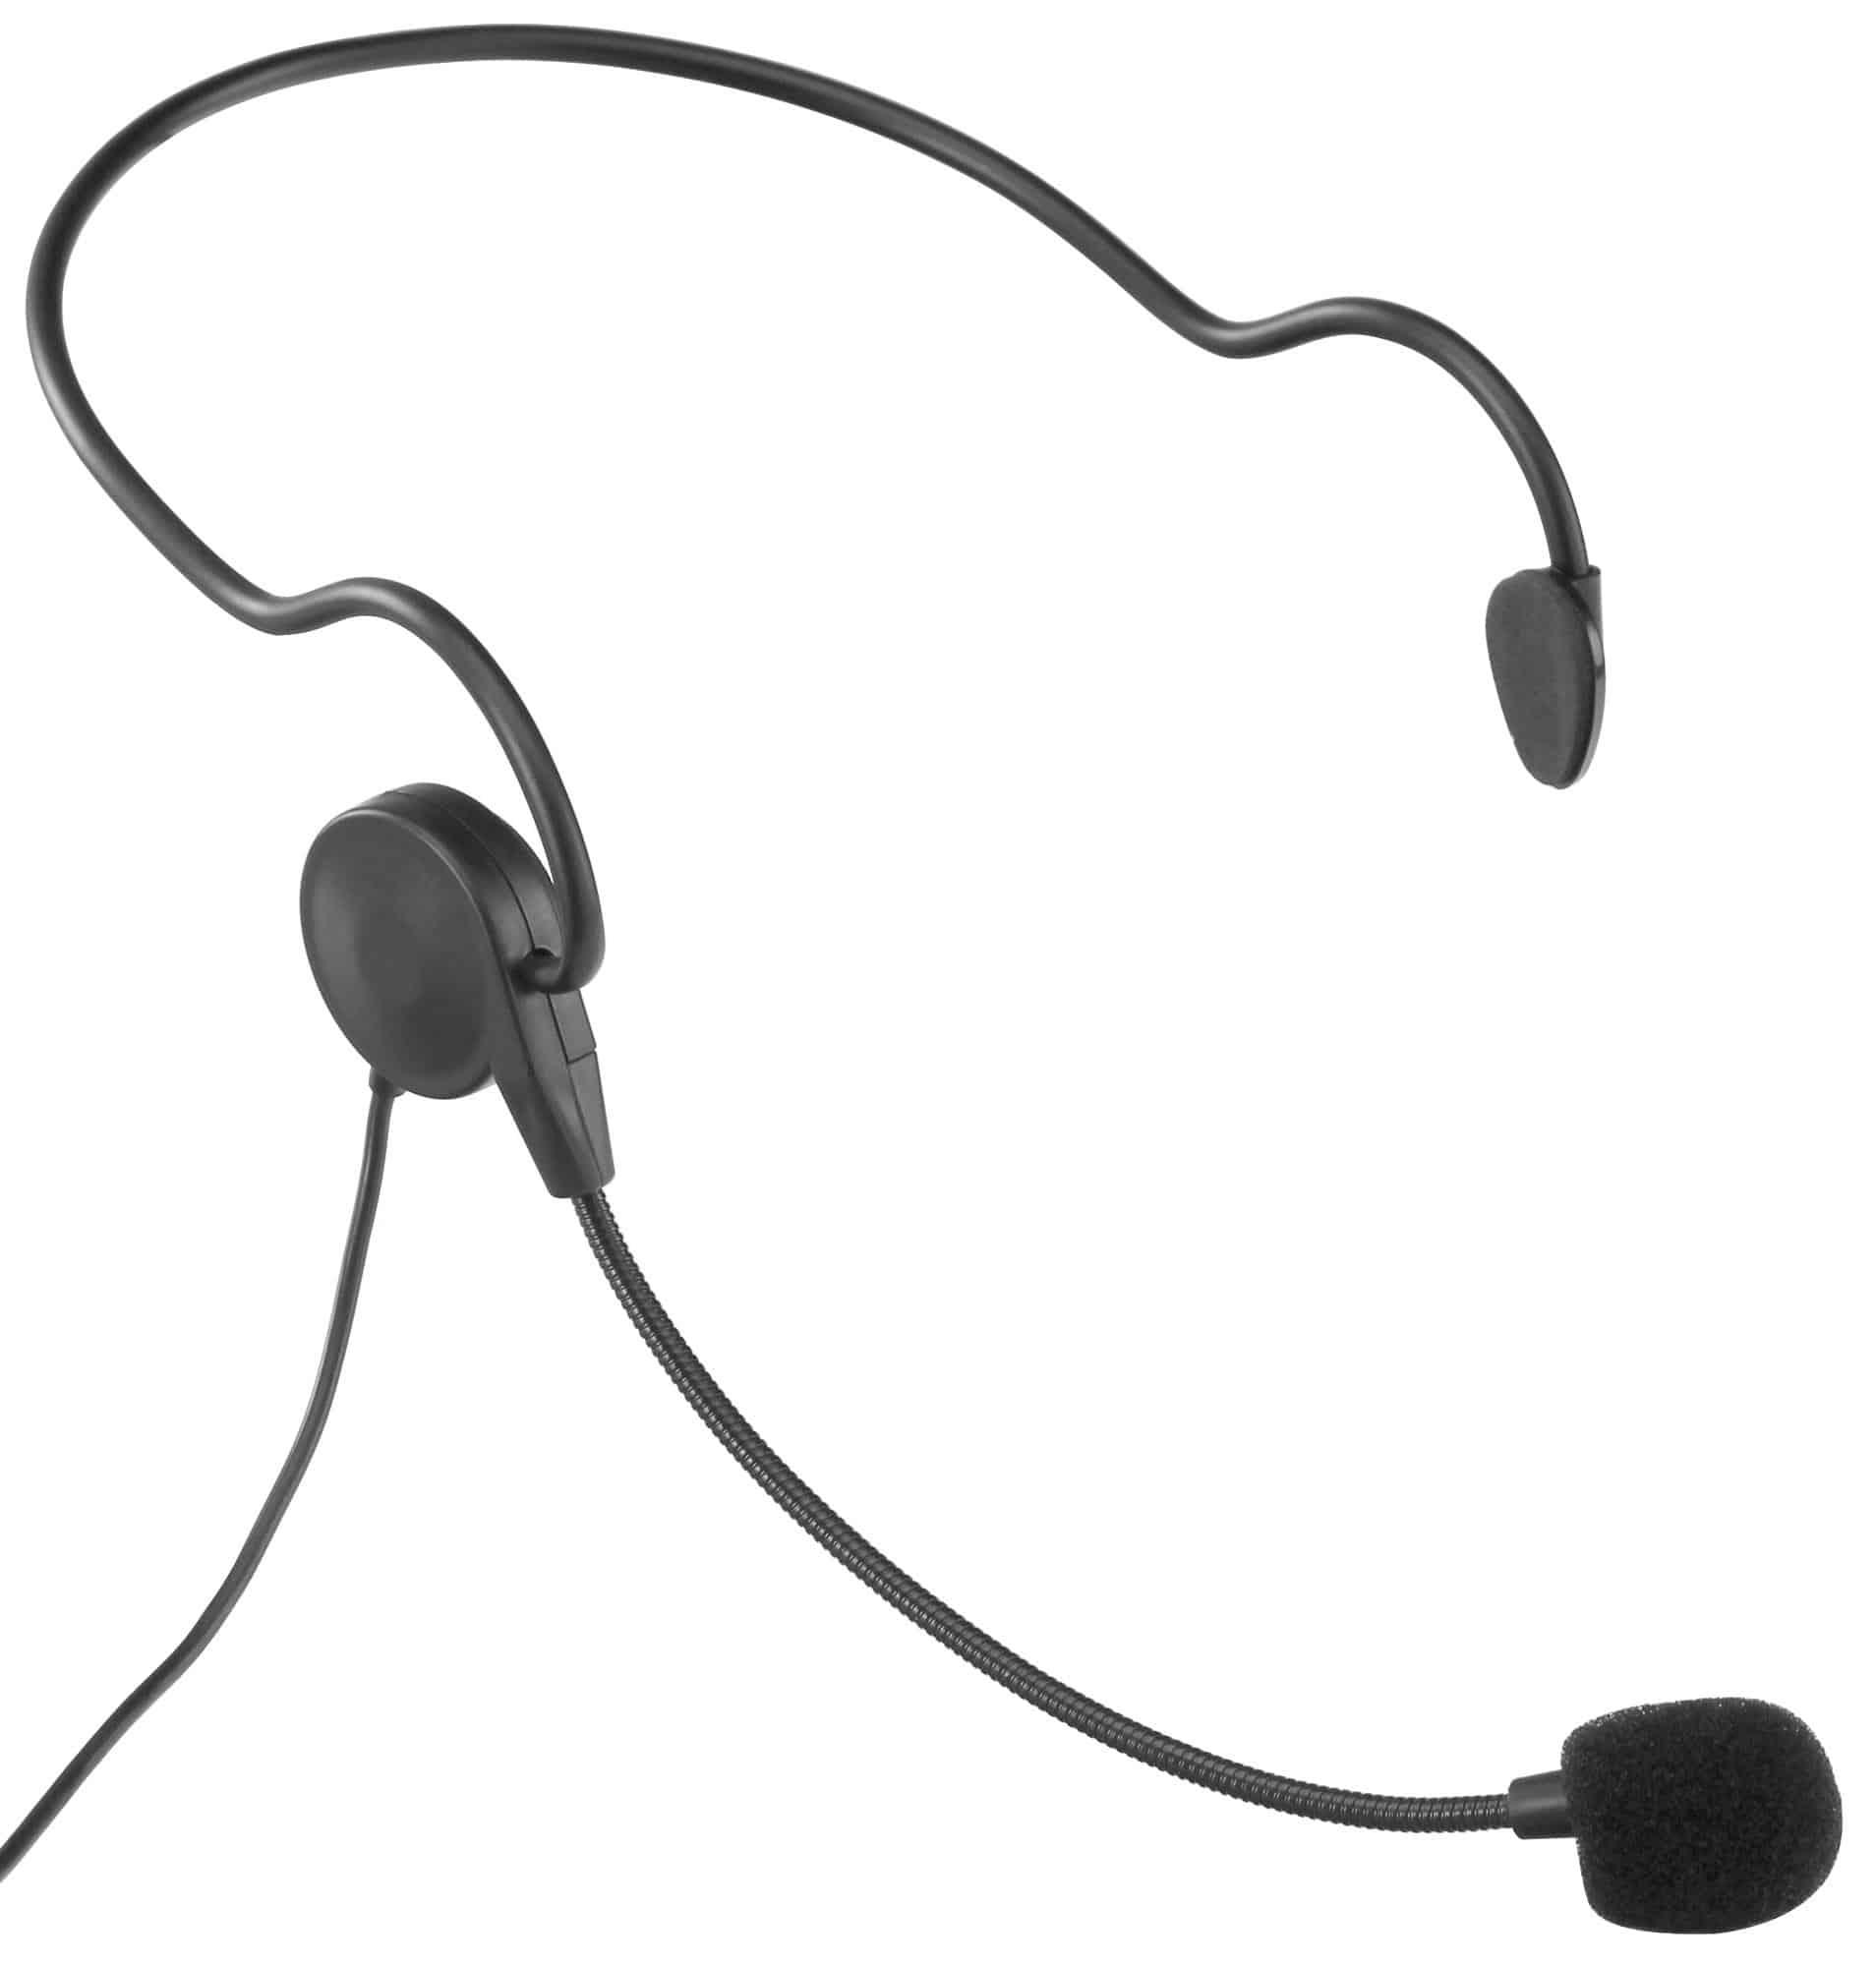 McGrey HS 20 Headset Mikrofon